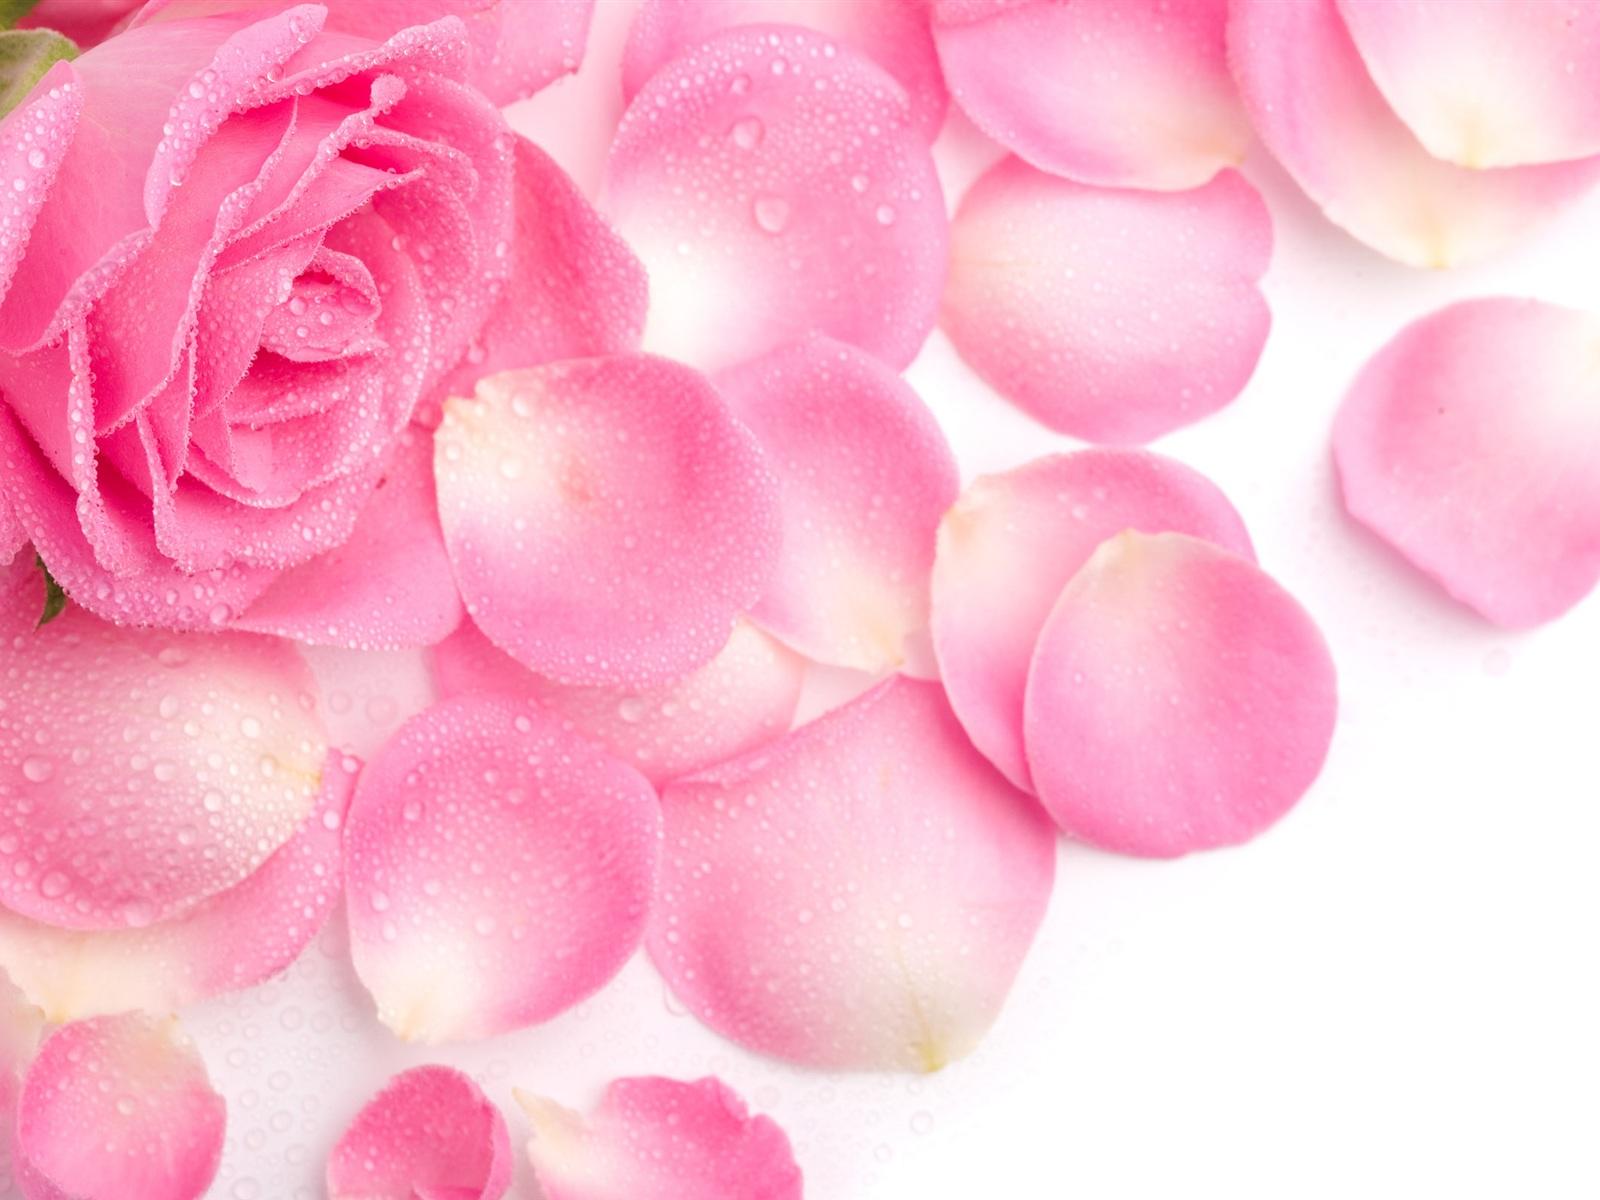 Pink rose petals wallpaper 1600x1200 resolution - Red rose petals wallpaper ...